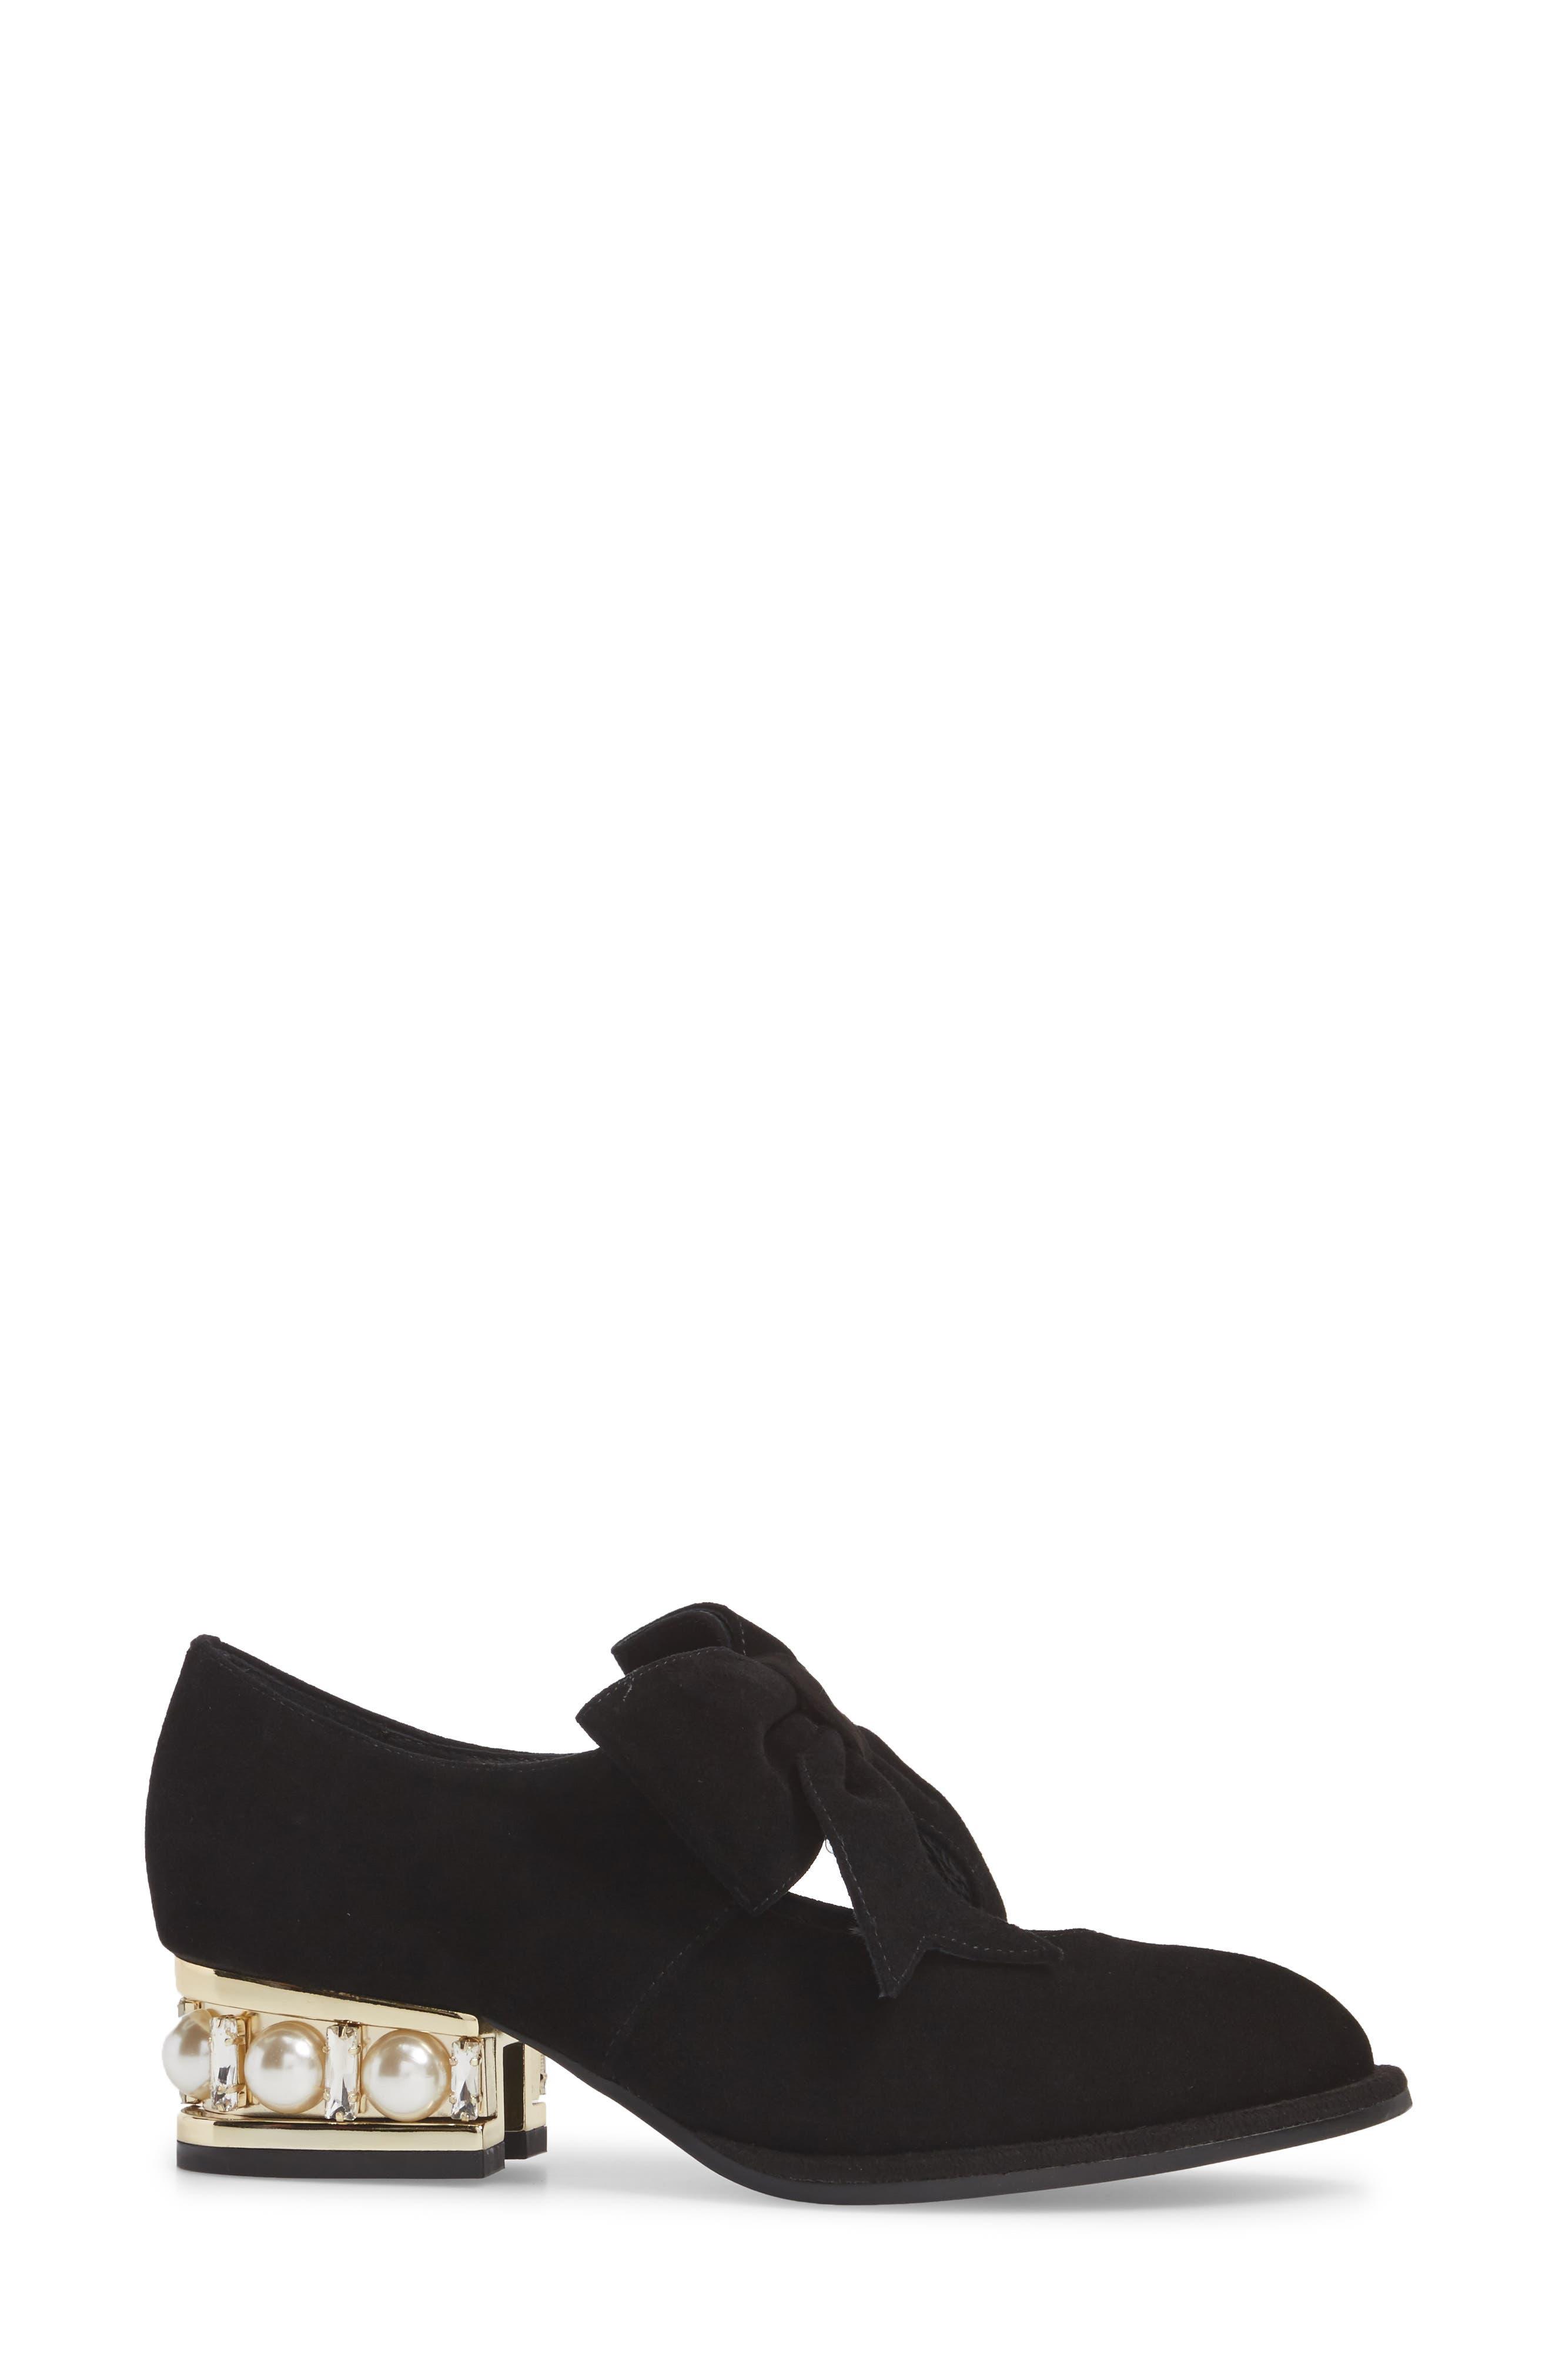 Cordene Embellished Bow Pump,                             Alternate thumbnail 3, color,                             Black/ Gold Suede